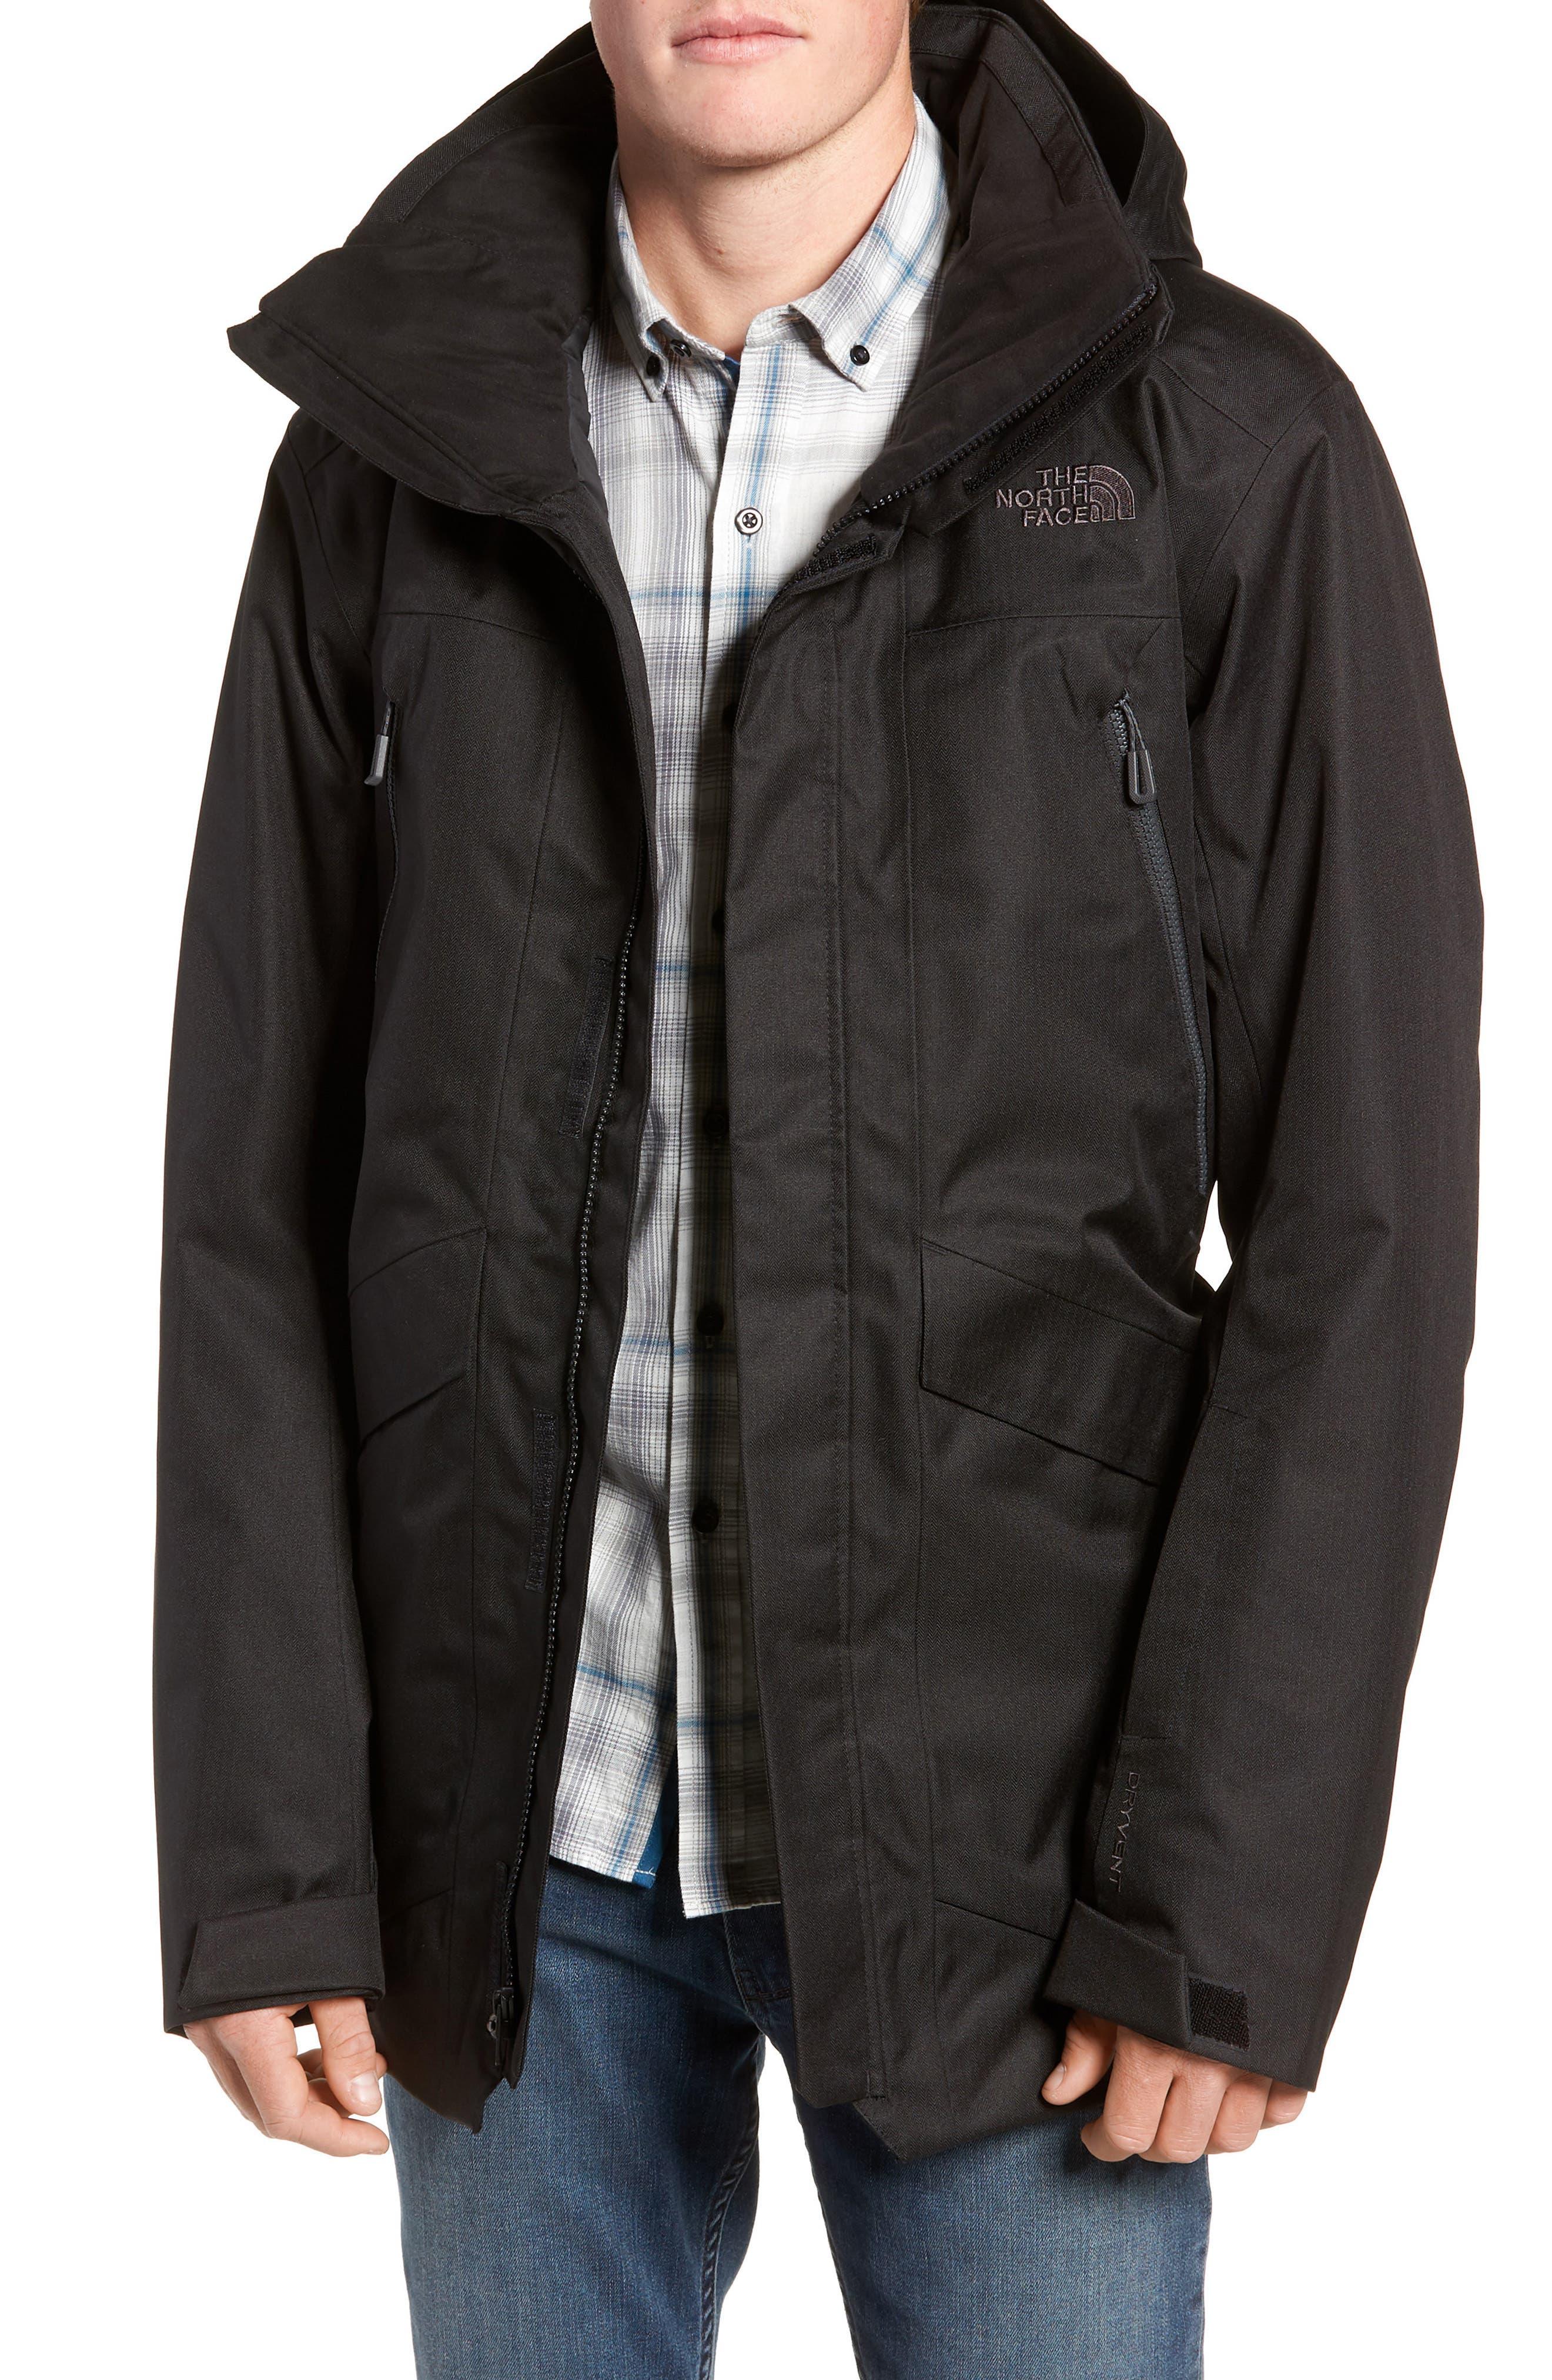 THE NORTH FACE Gatekeeper Waterproof Jacket, Main, color, 005